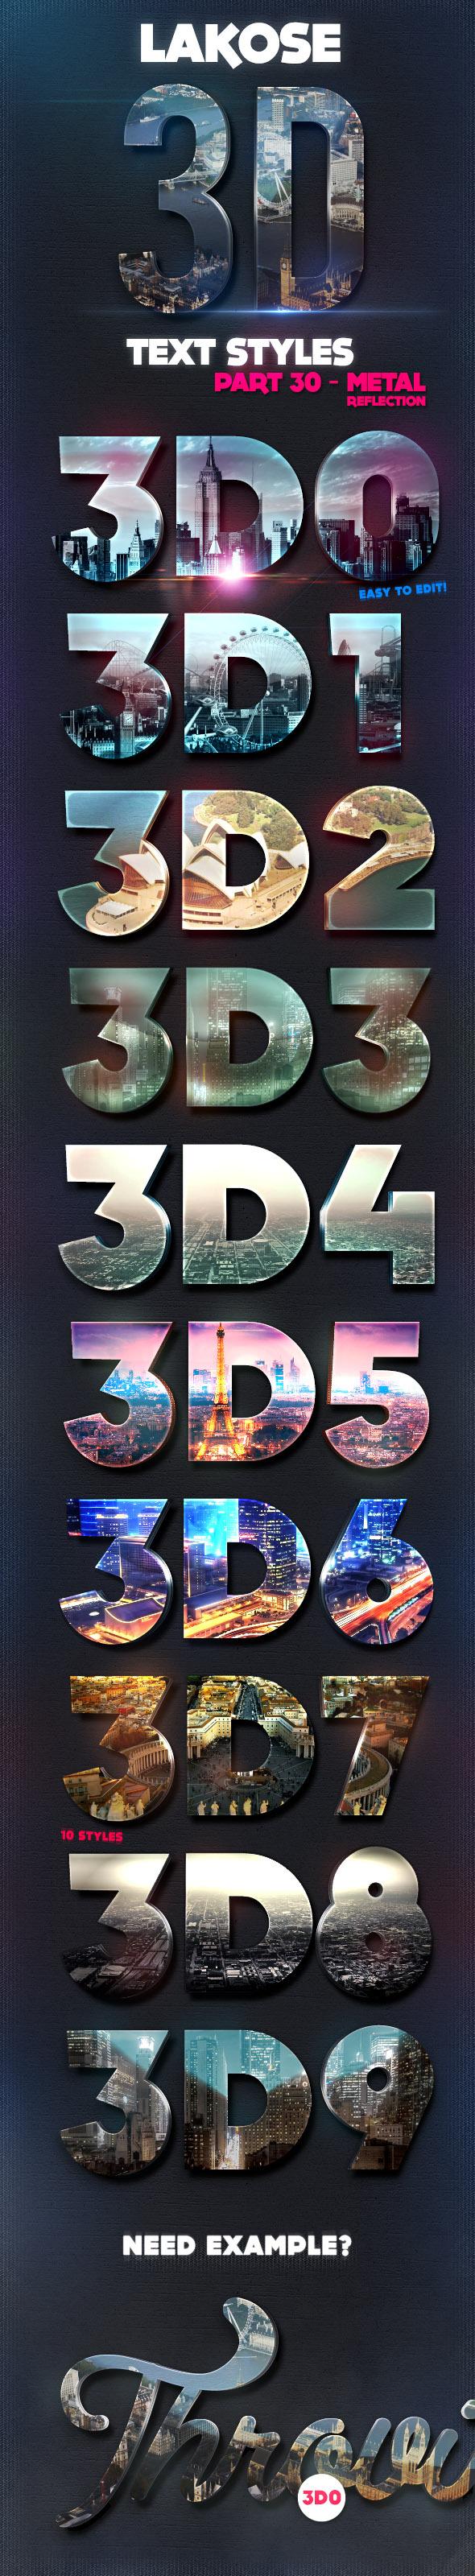 Lakose 3D Text Styles Part 30 - Text Effects Styles